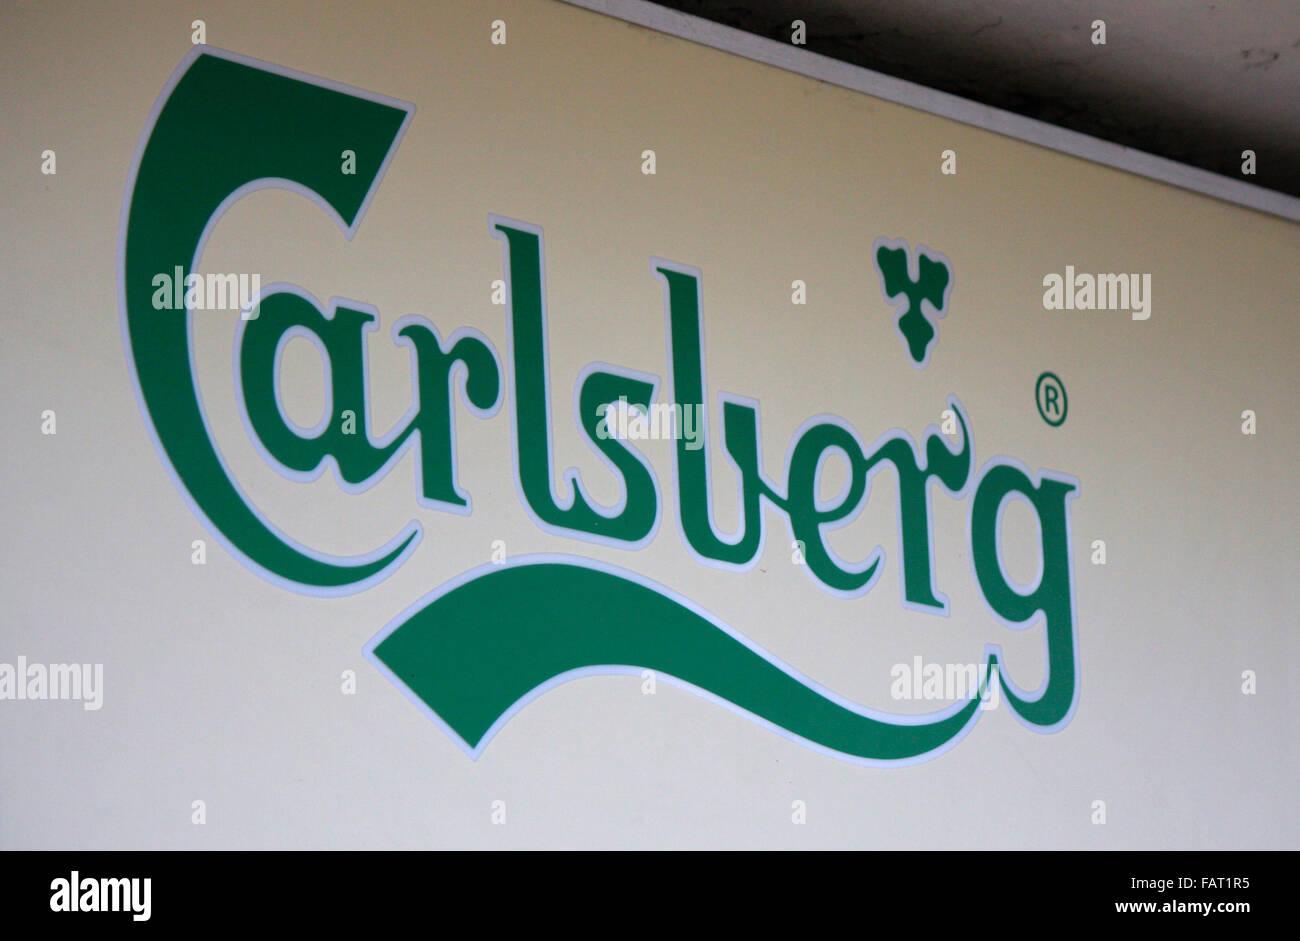 Markenname: 'Carlsberg', Berlin. - Stock Image